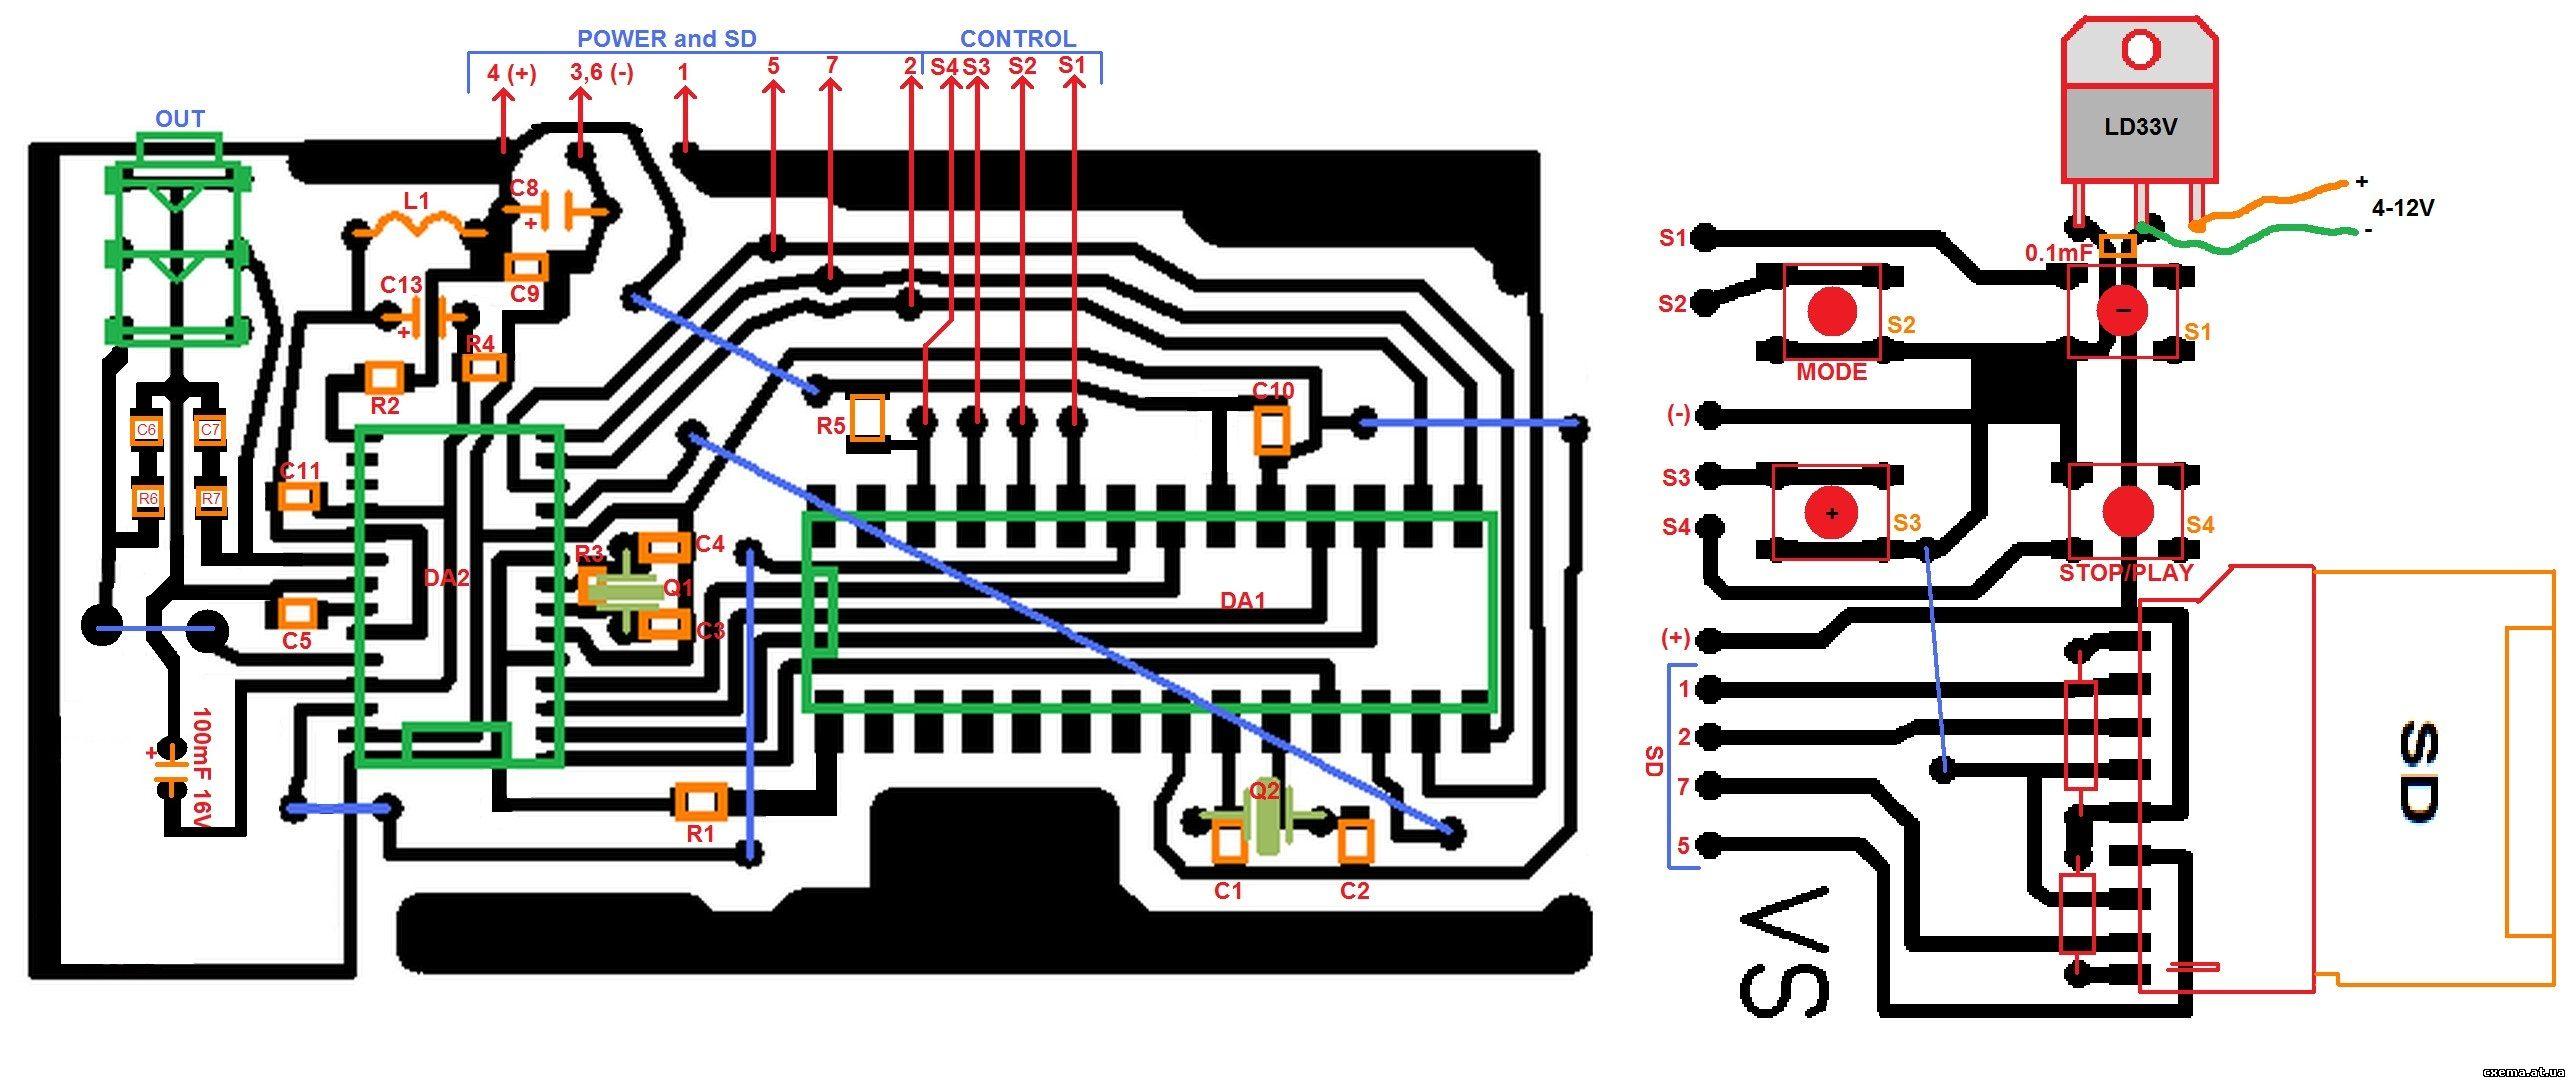 Схема простого MP3 плеера.